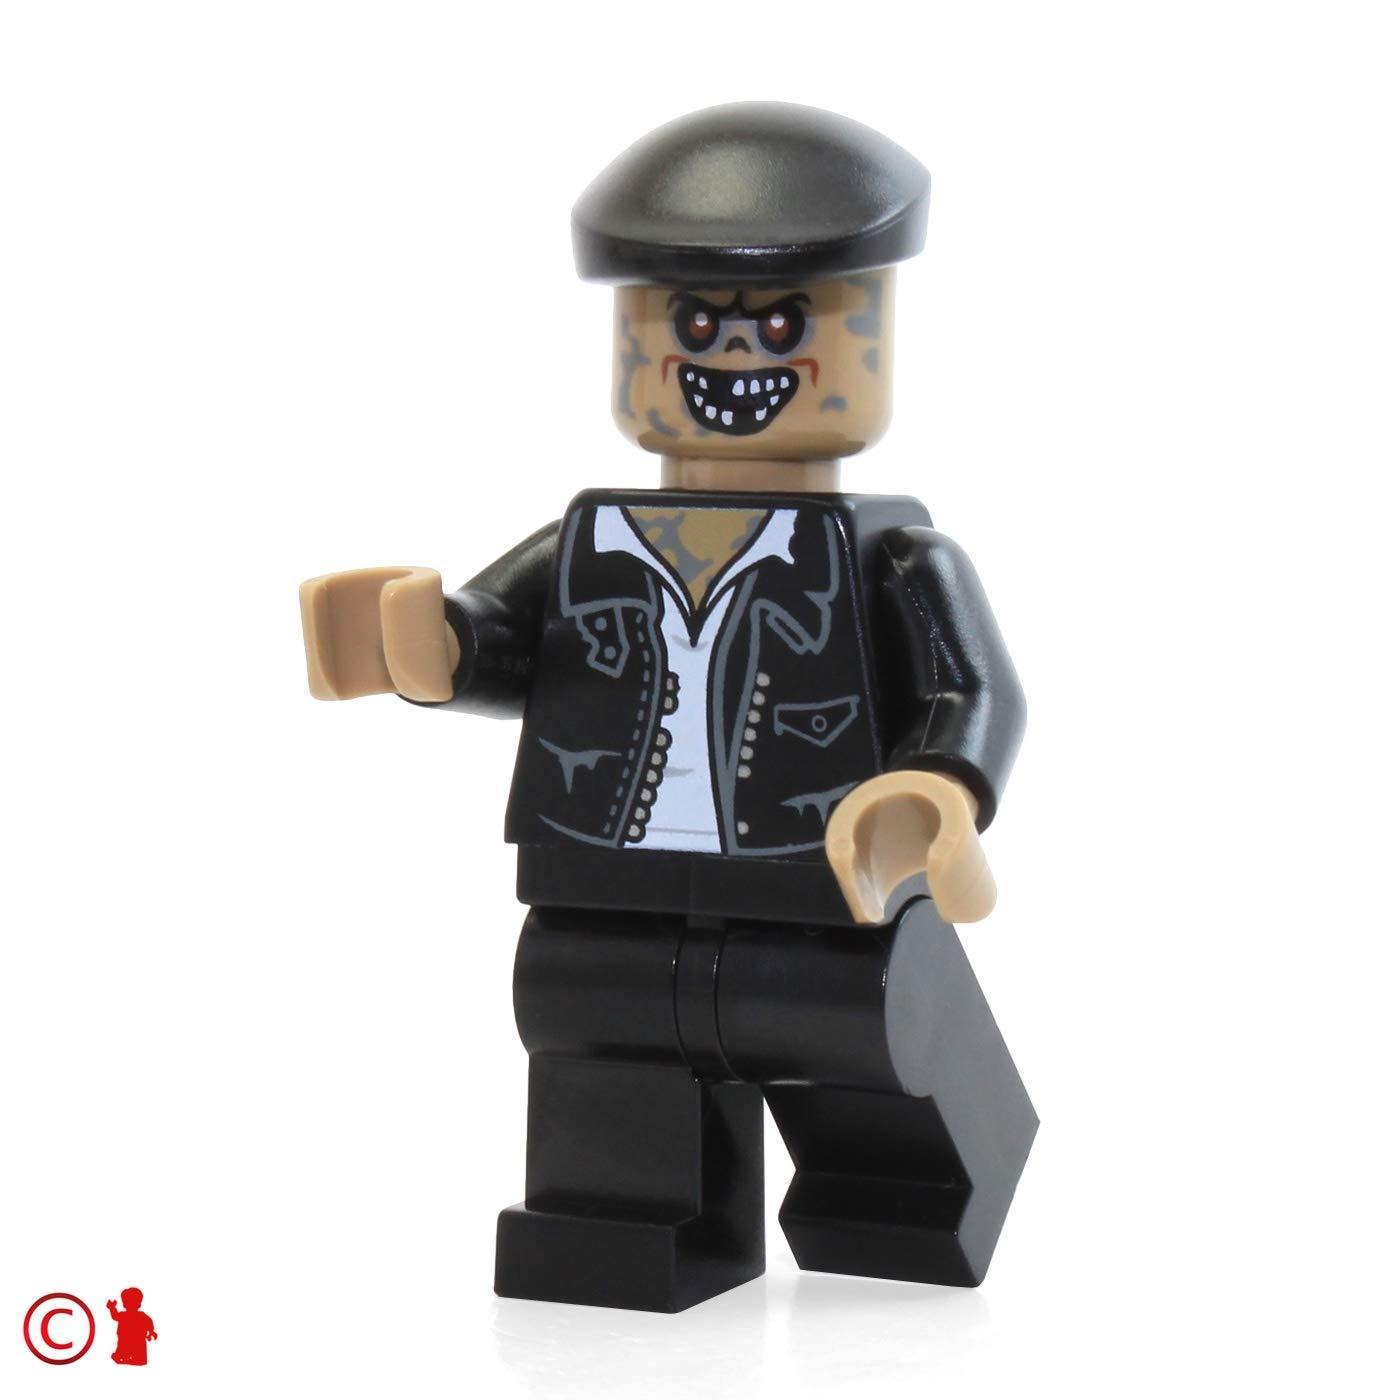 75827 Ghostbusters Ghost Trans-Medium Blue LEGO Ghostbusters MiniFigure